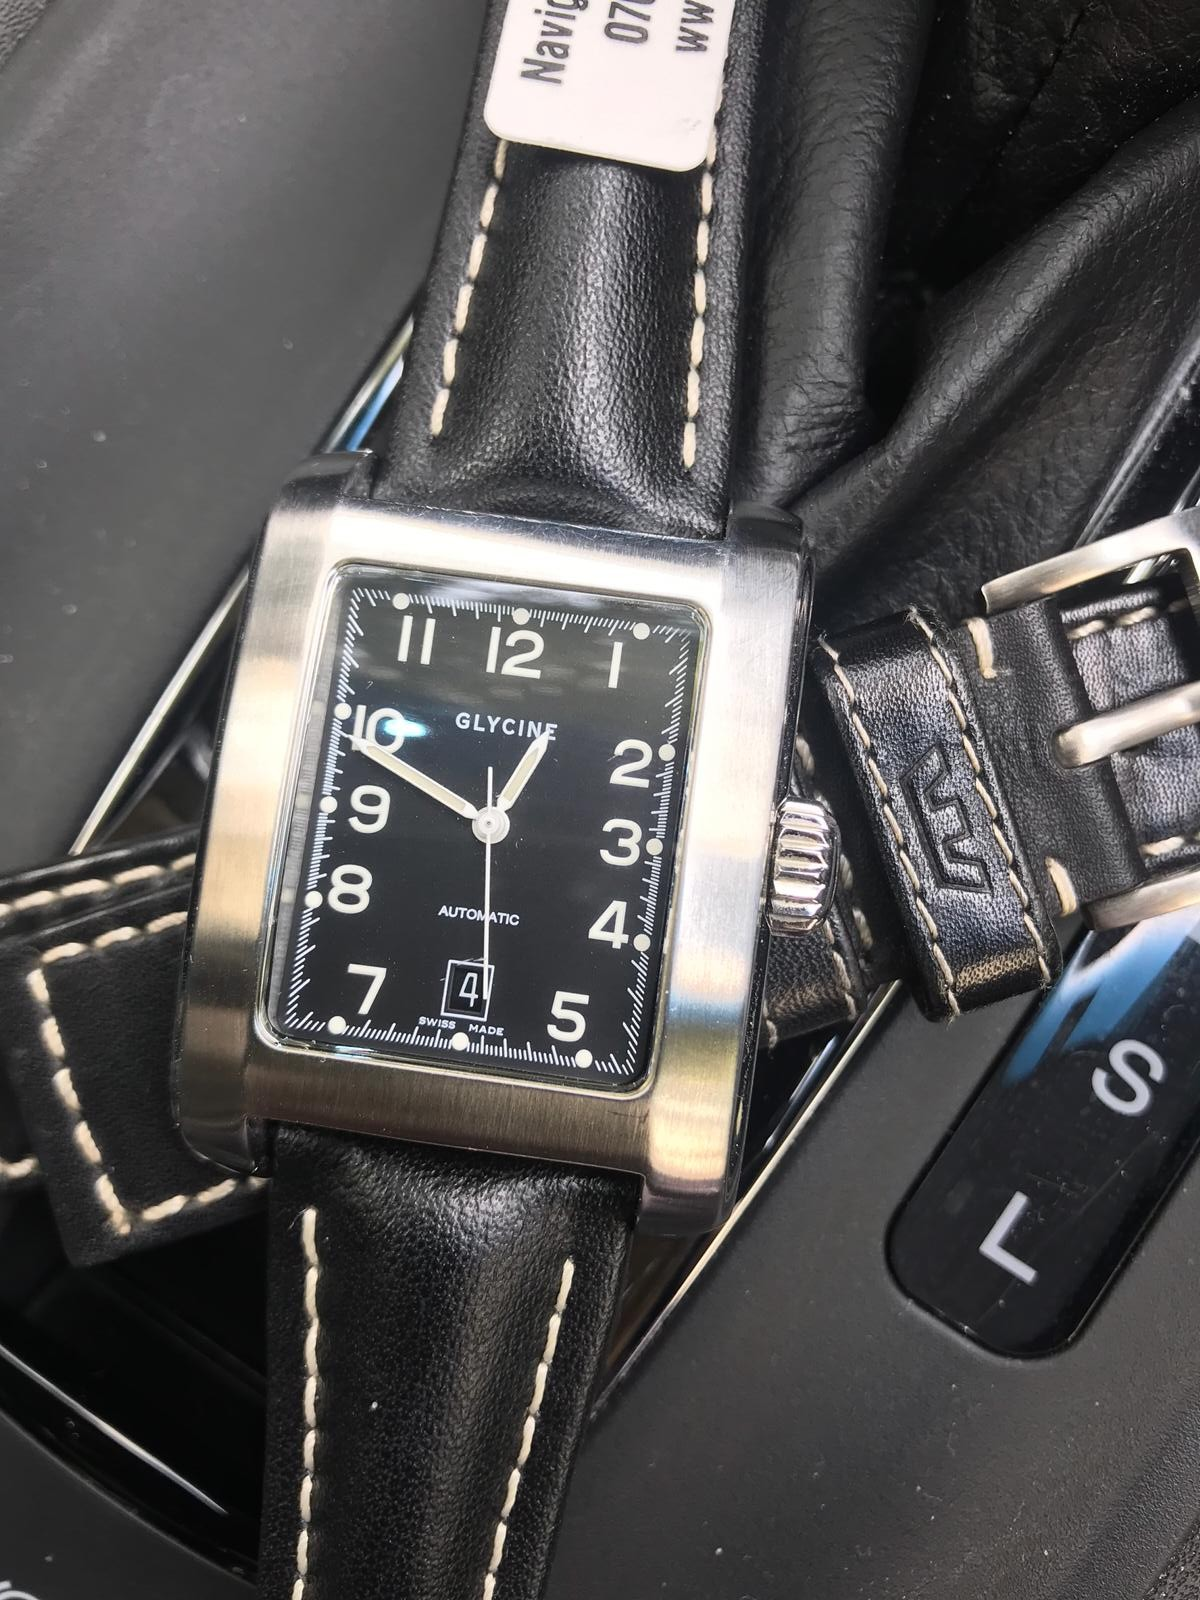 Update Glycine Grand Carre Swiss Automatic Dress Watch W Hirsh Leather Strap